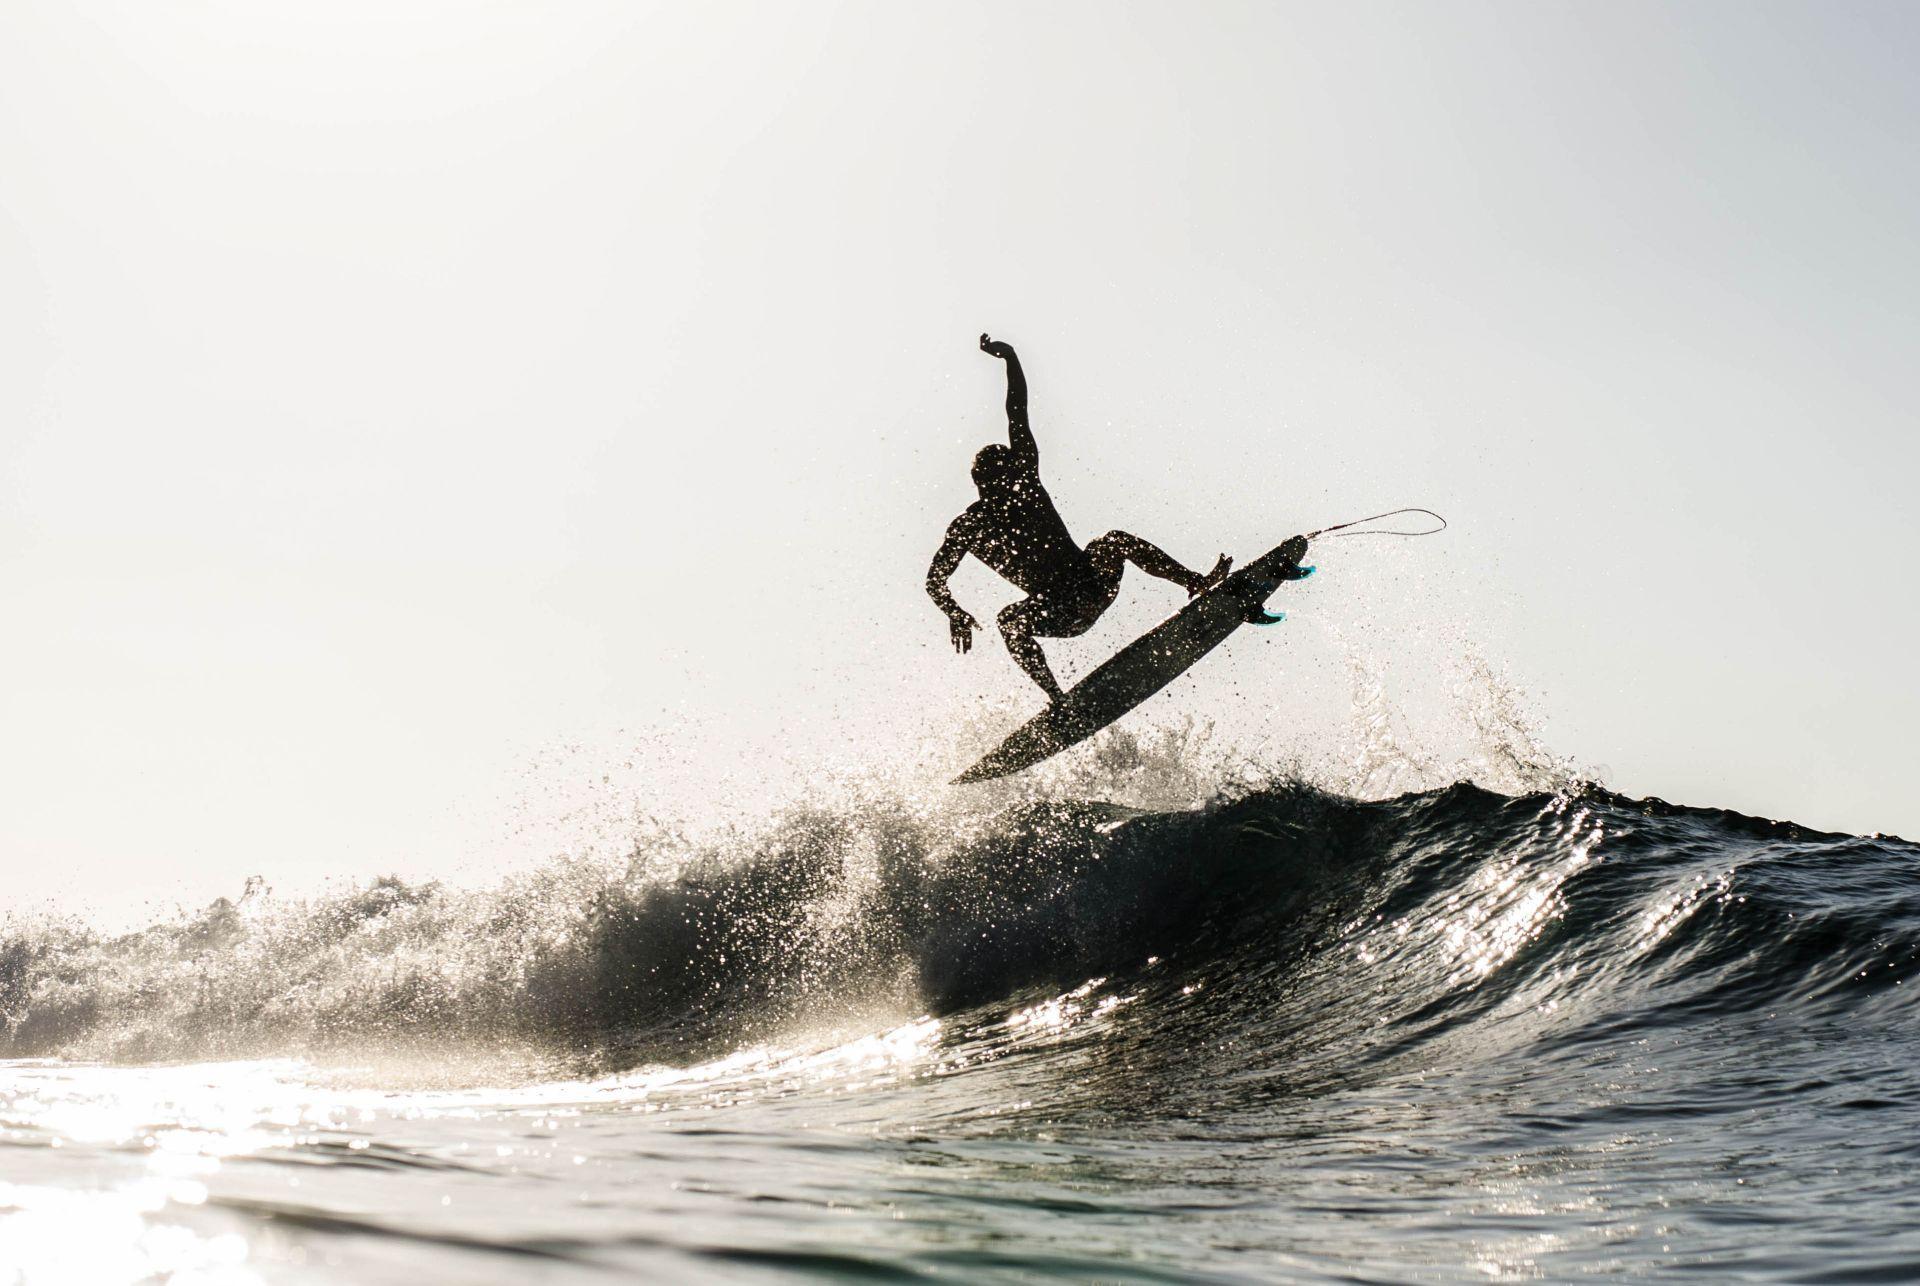 Greece sports: Surfing